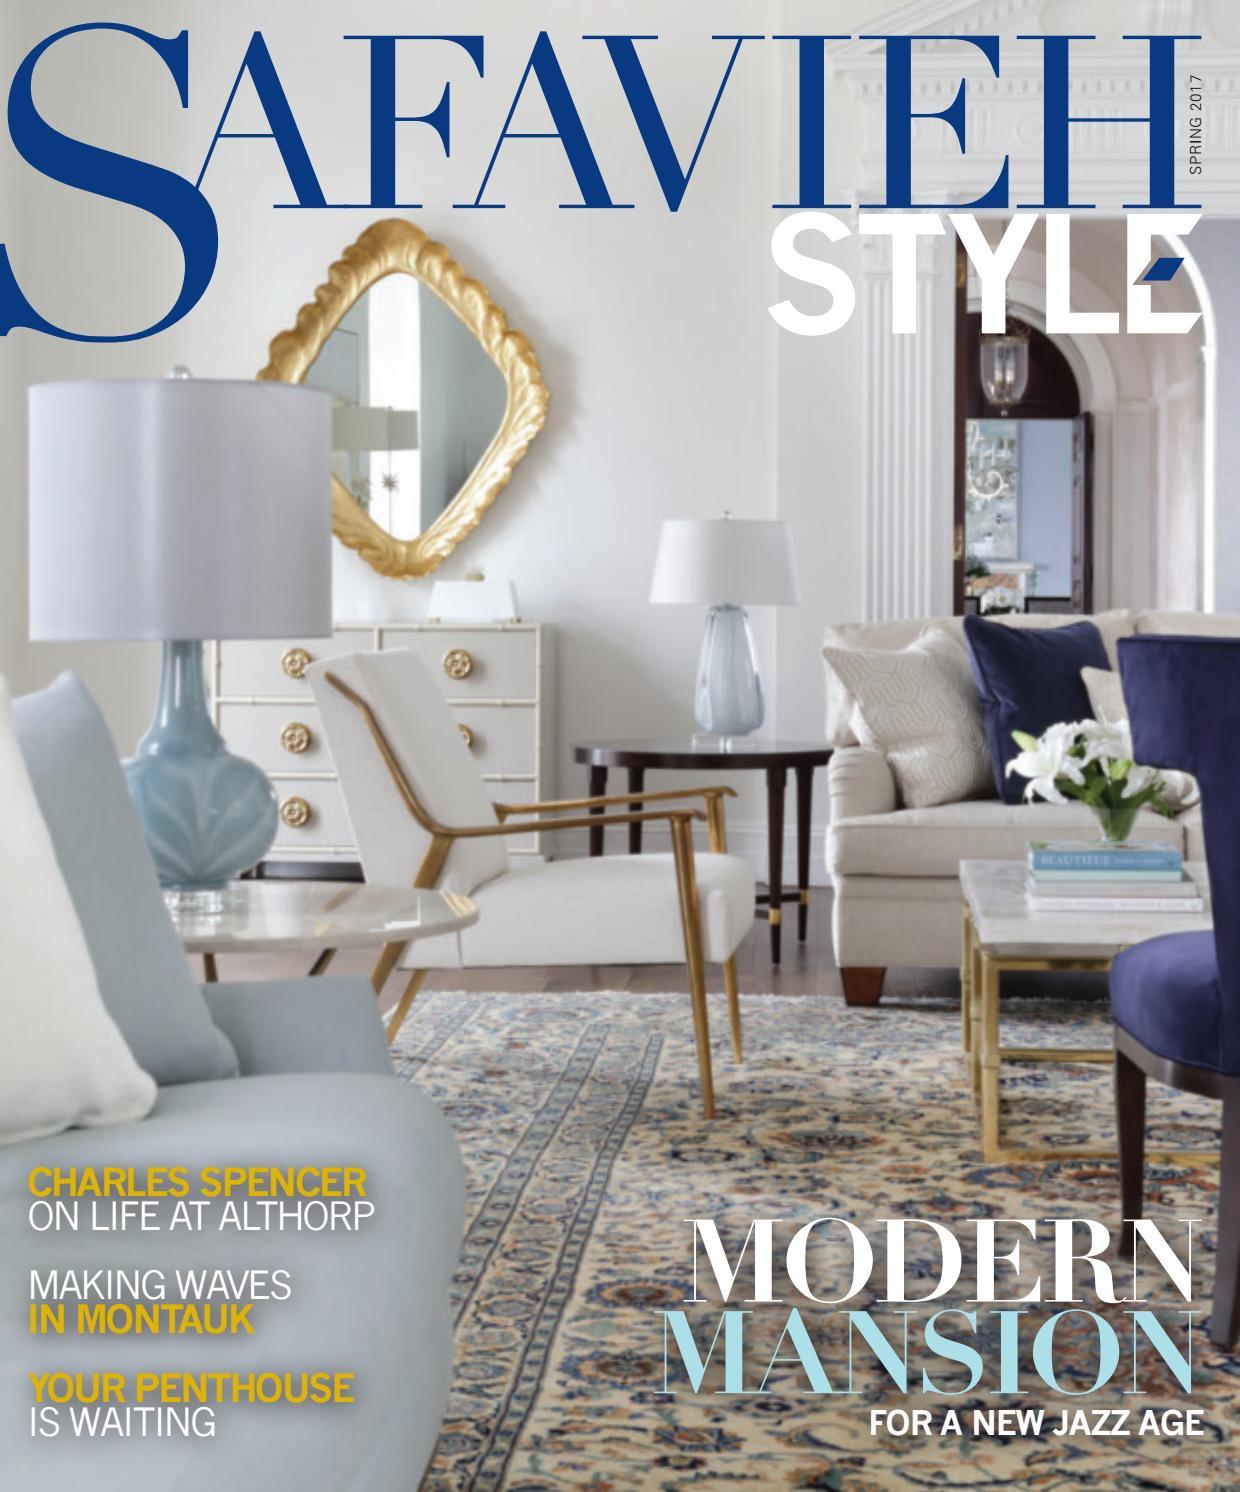 Transformation Palette En Jardiniere safavieh style: spring/summer 2017wainscot media - issuu